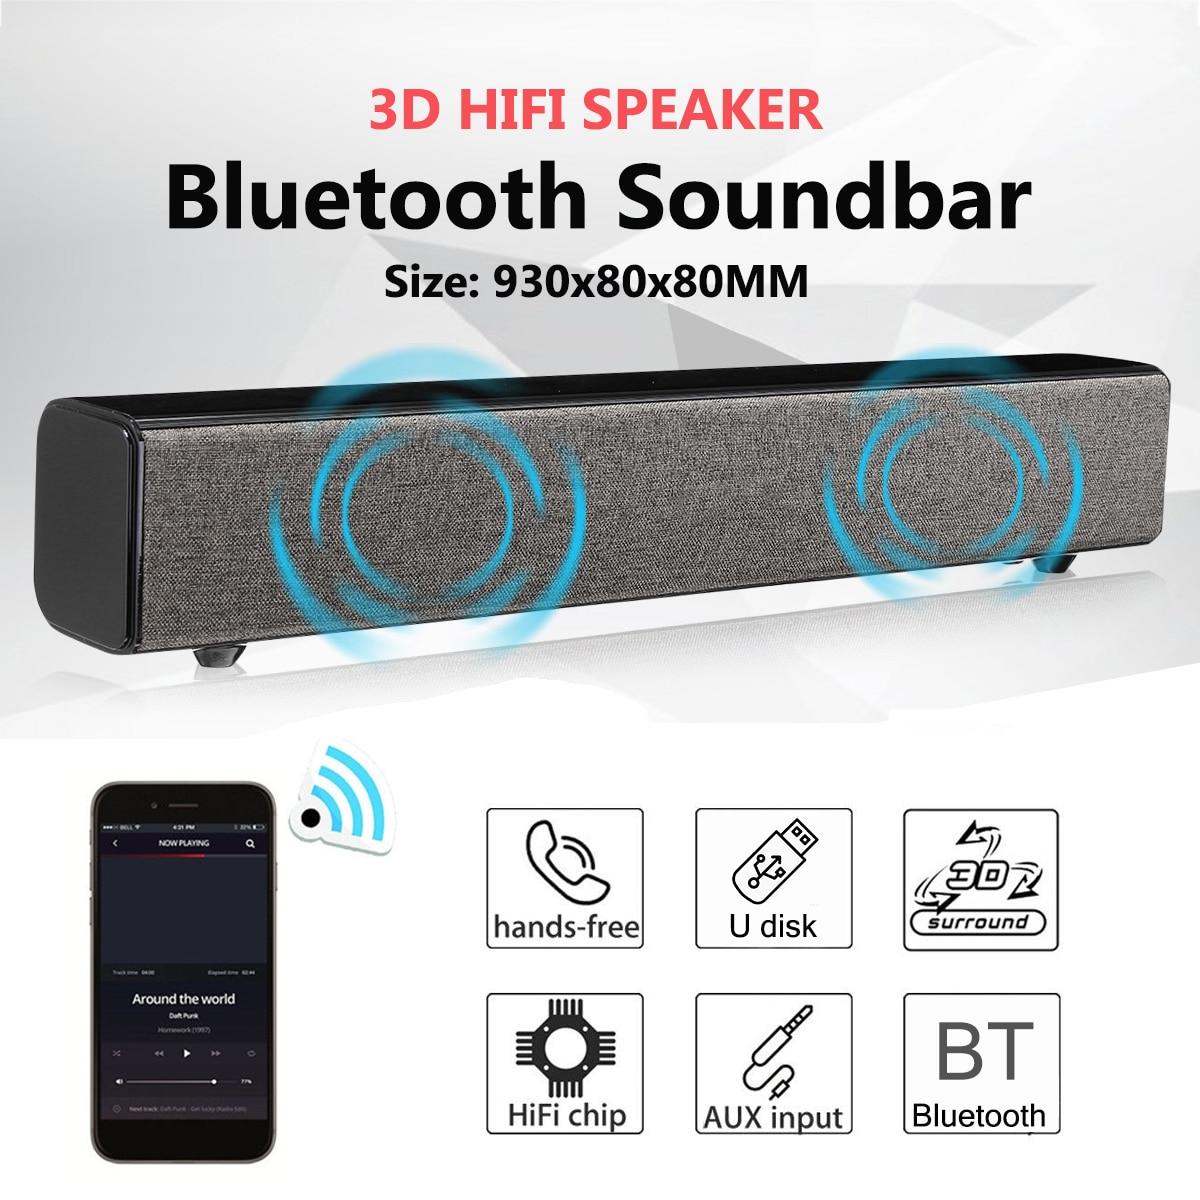 Home Theater 50W Bluetooth Soundbar TV AUX Optic Bluetooth Soundbar Speakers Soundbar with Subwoofer Speaker for TV with Remove wireless mini bluetooth soundbar for tv